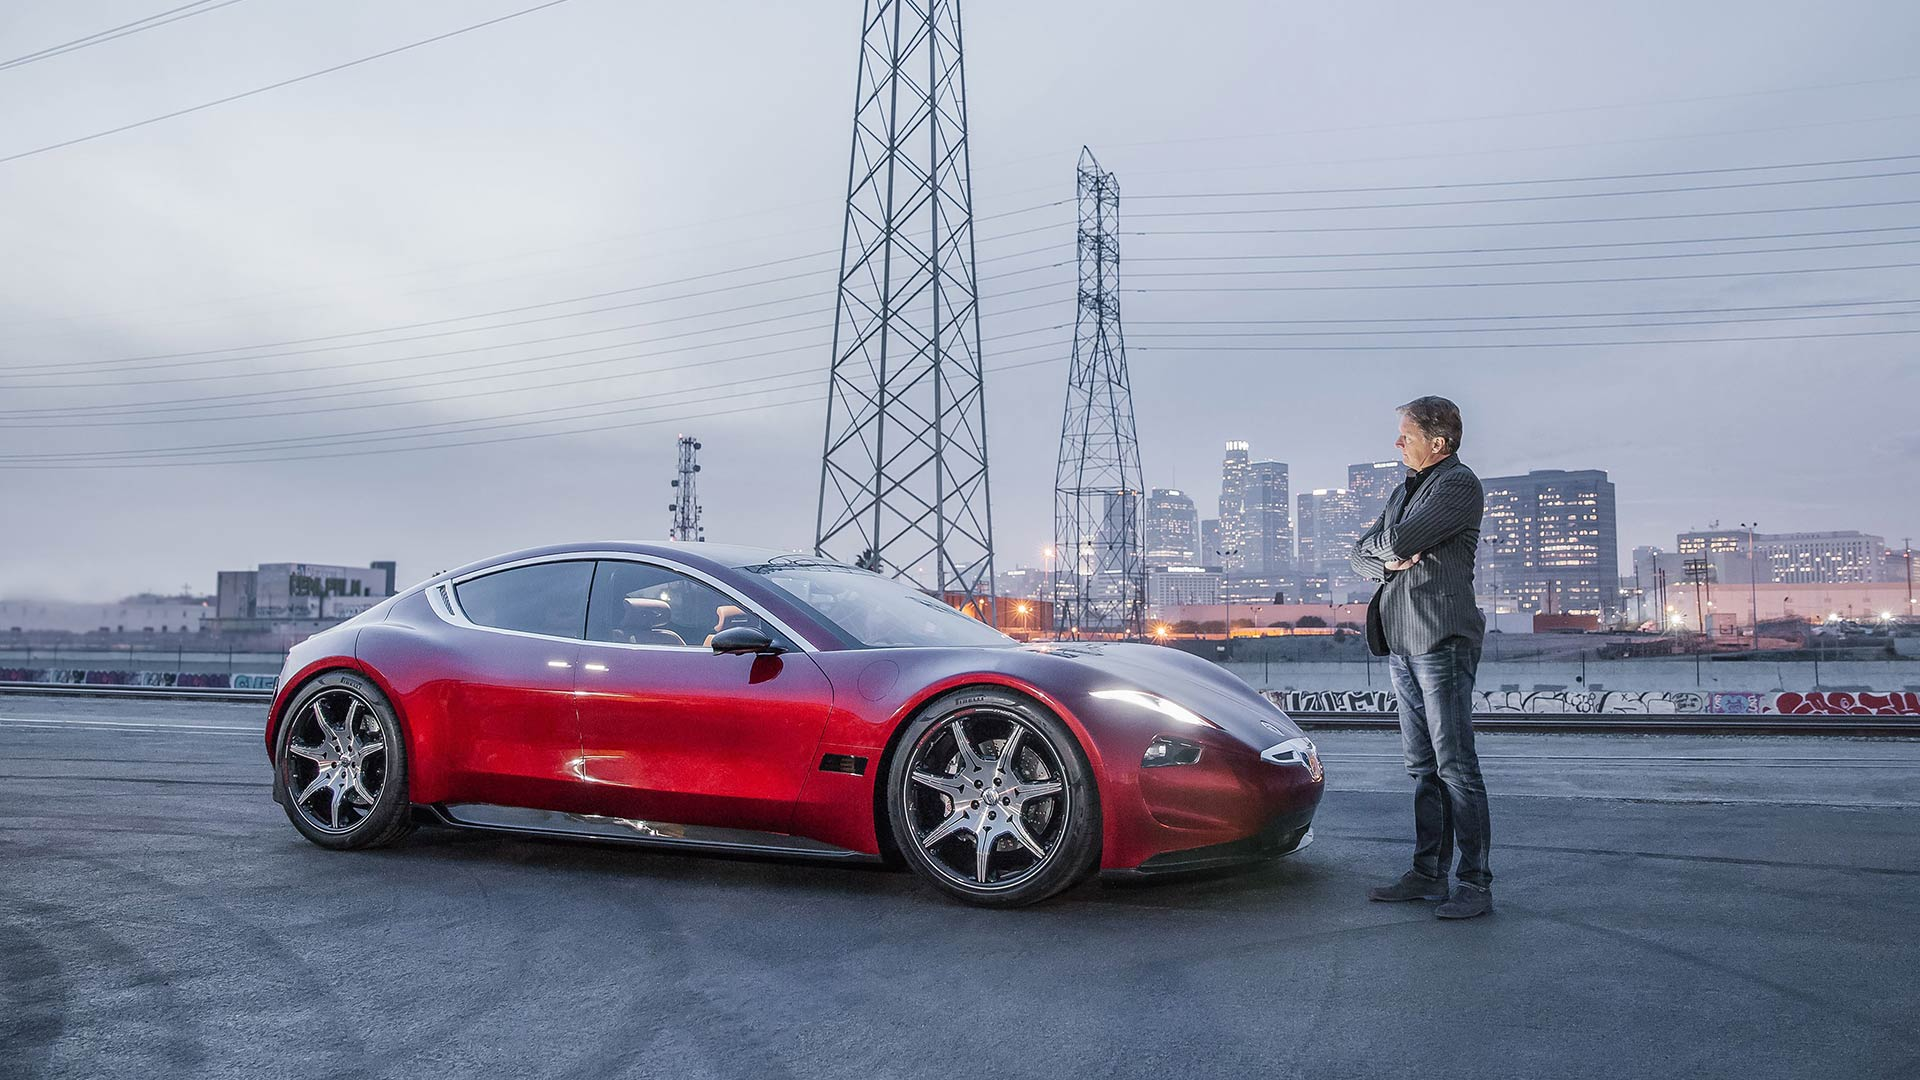 2021 Fisker new electric luxury SUV